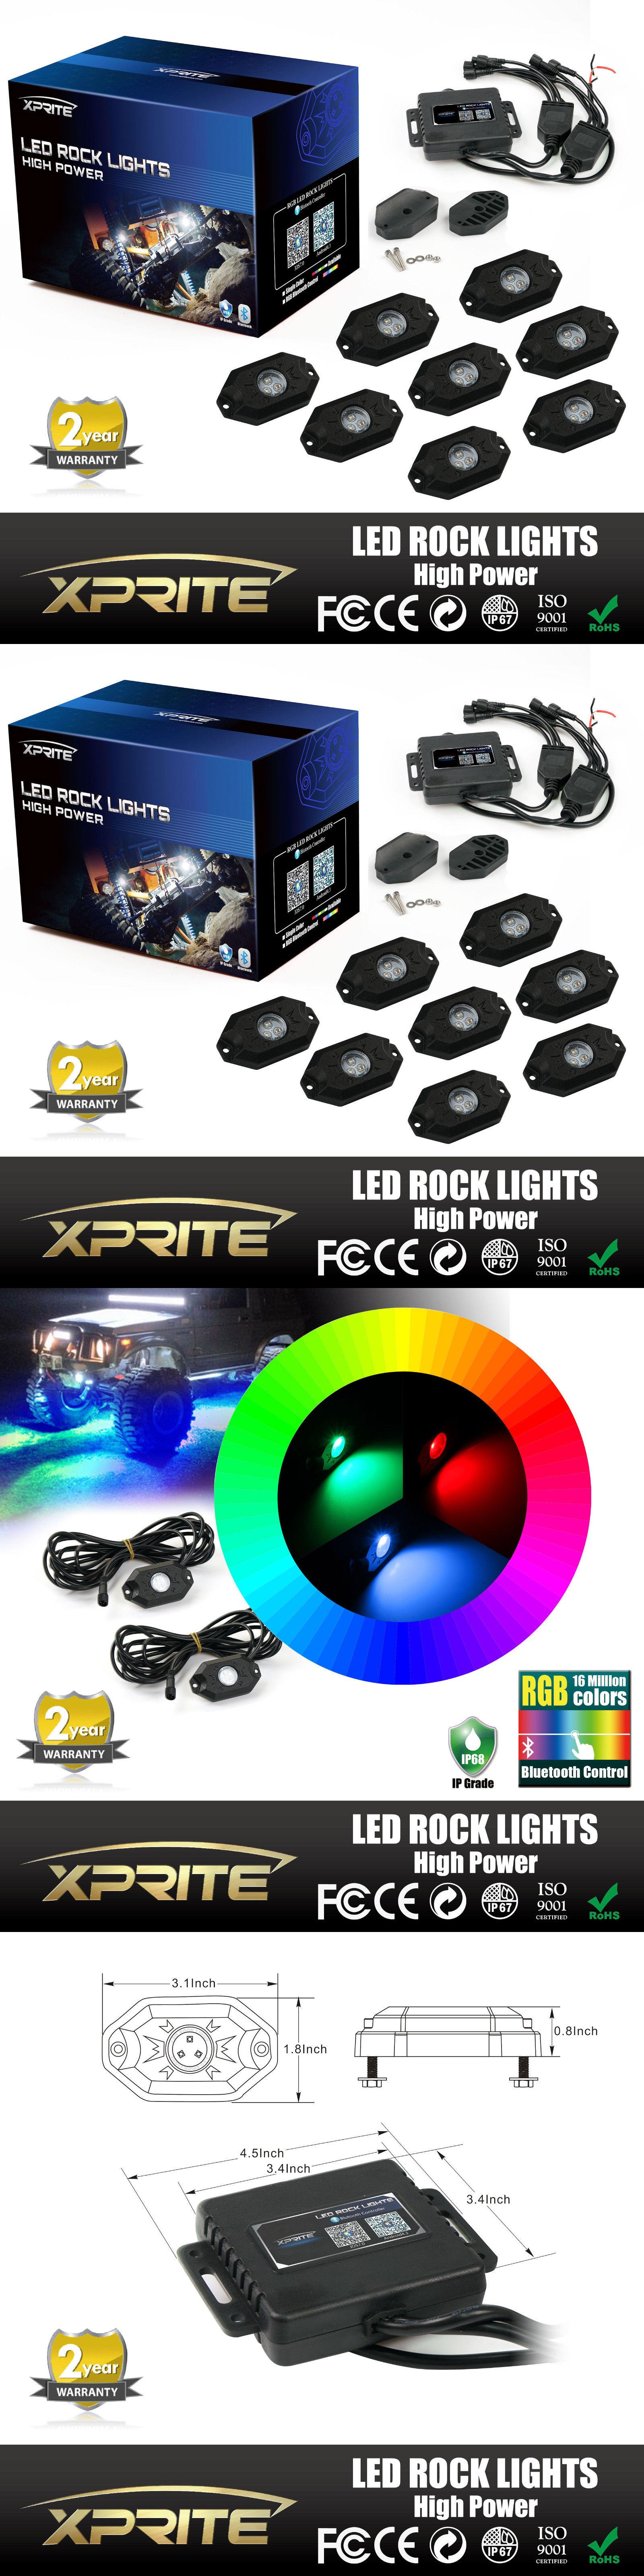 Car Lighting Xprite 8Pc Rgb Led Multi Color froad Rock Lights